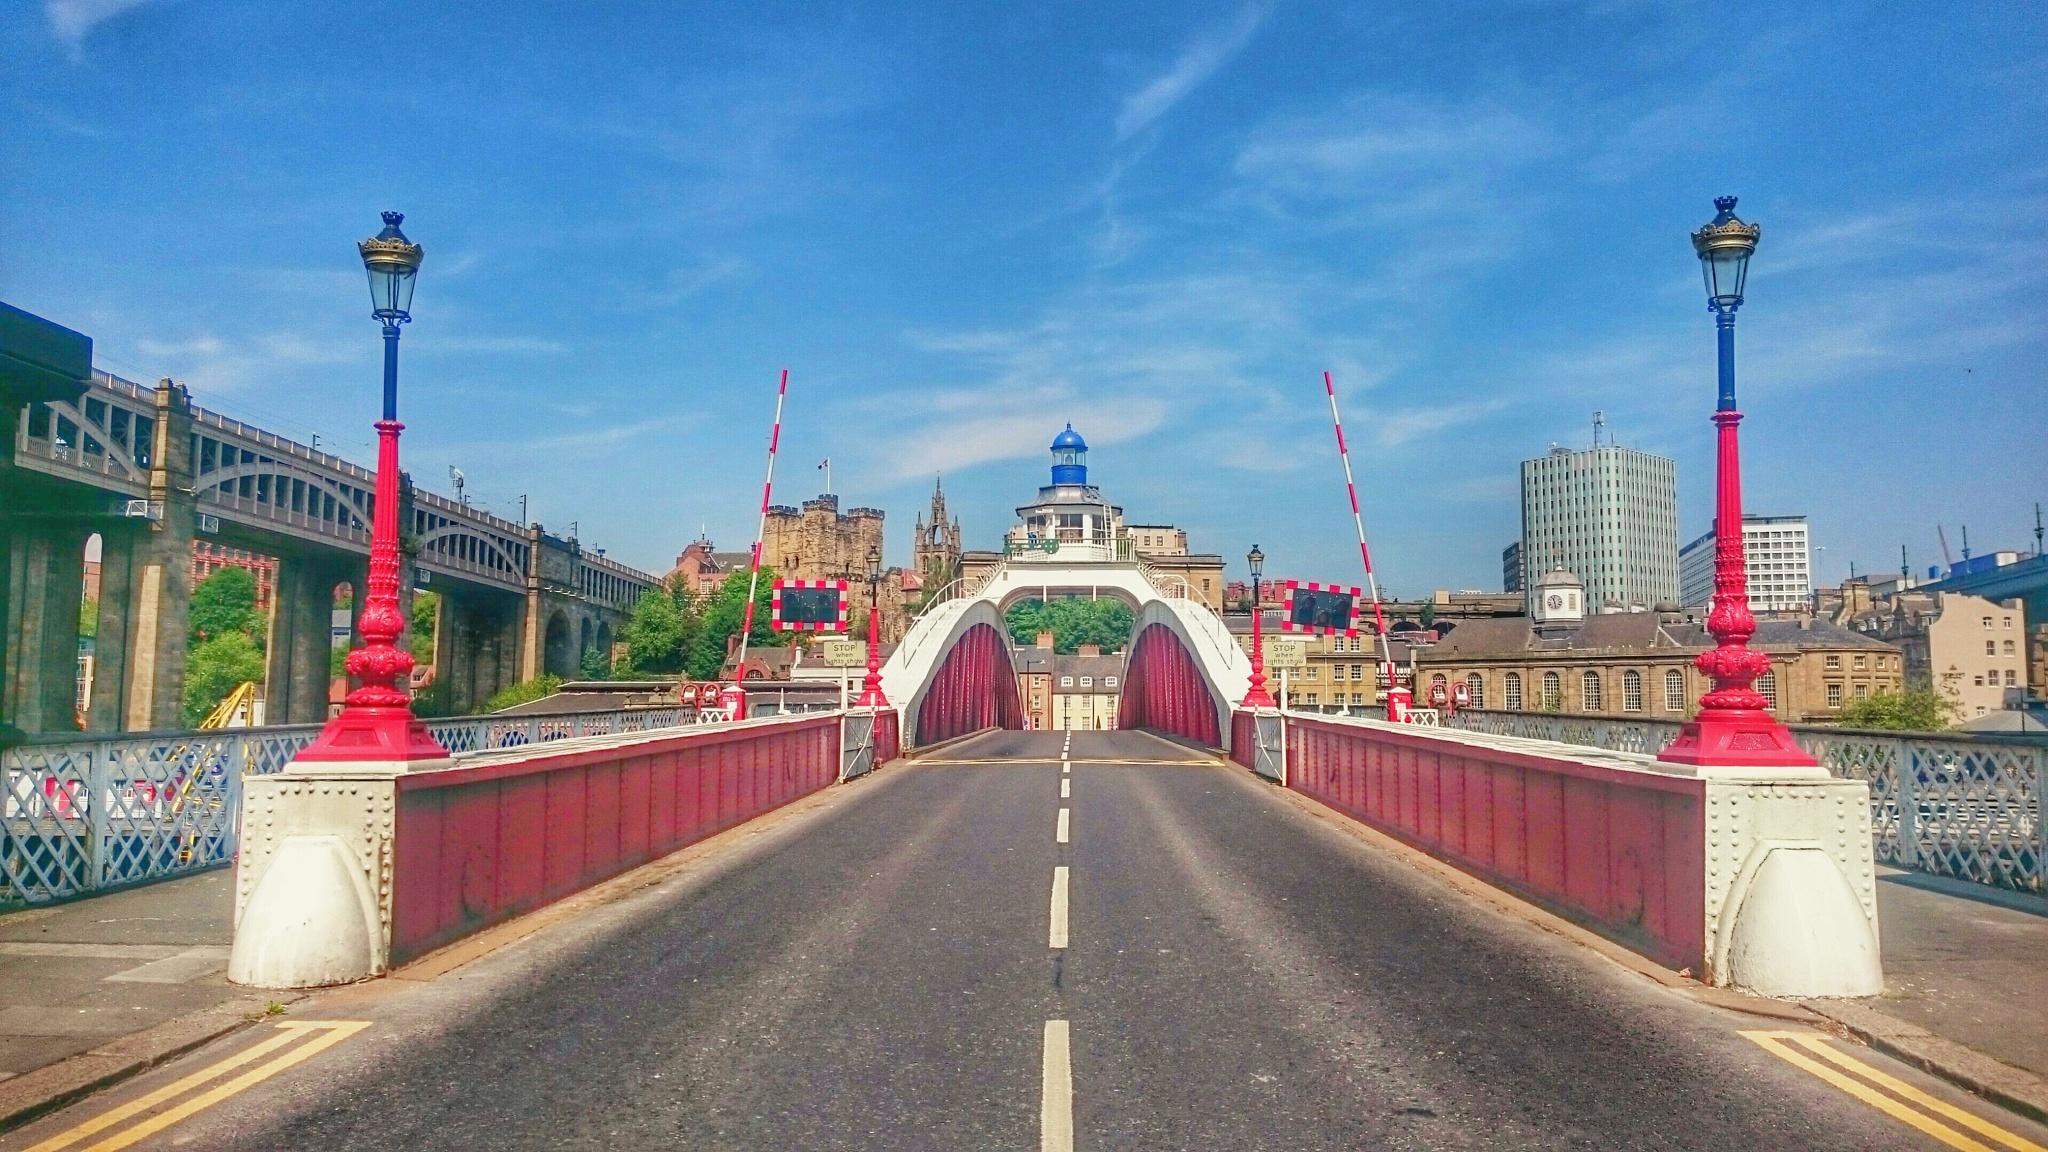 Swing Bridge today  by Darren Turner